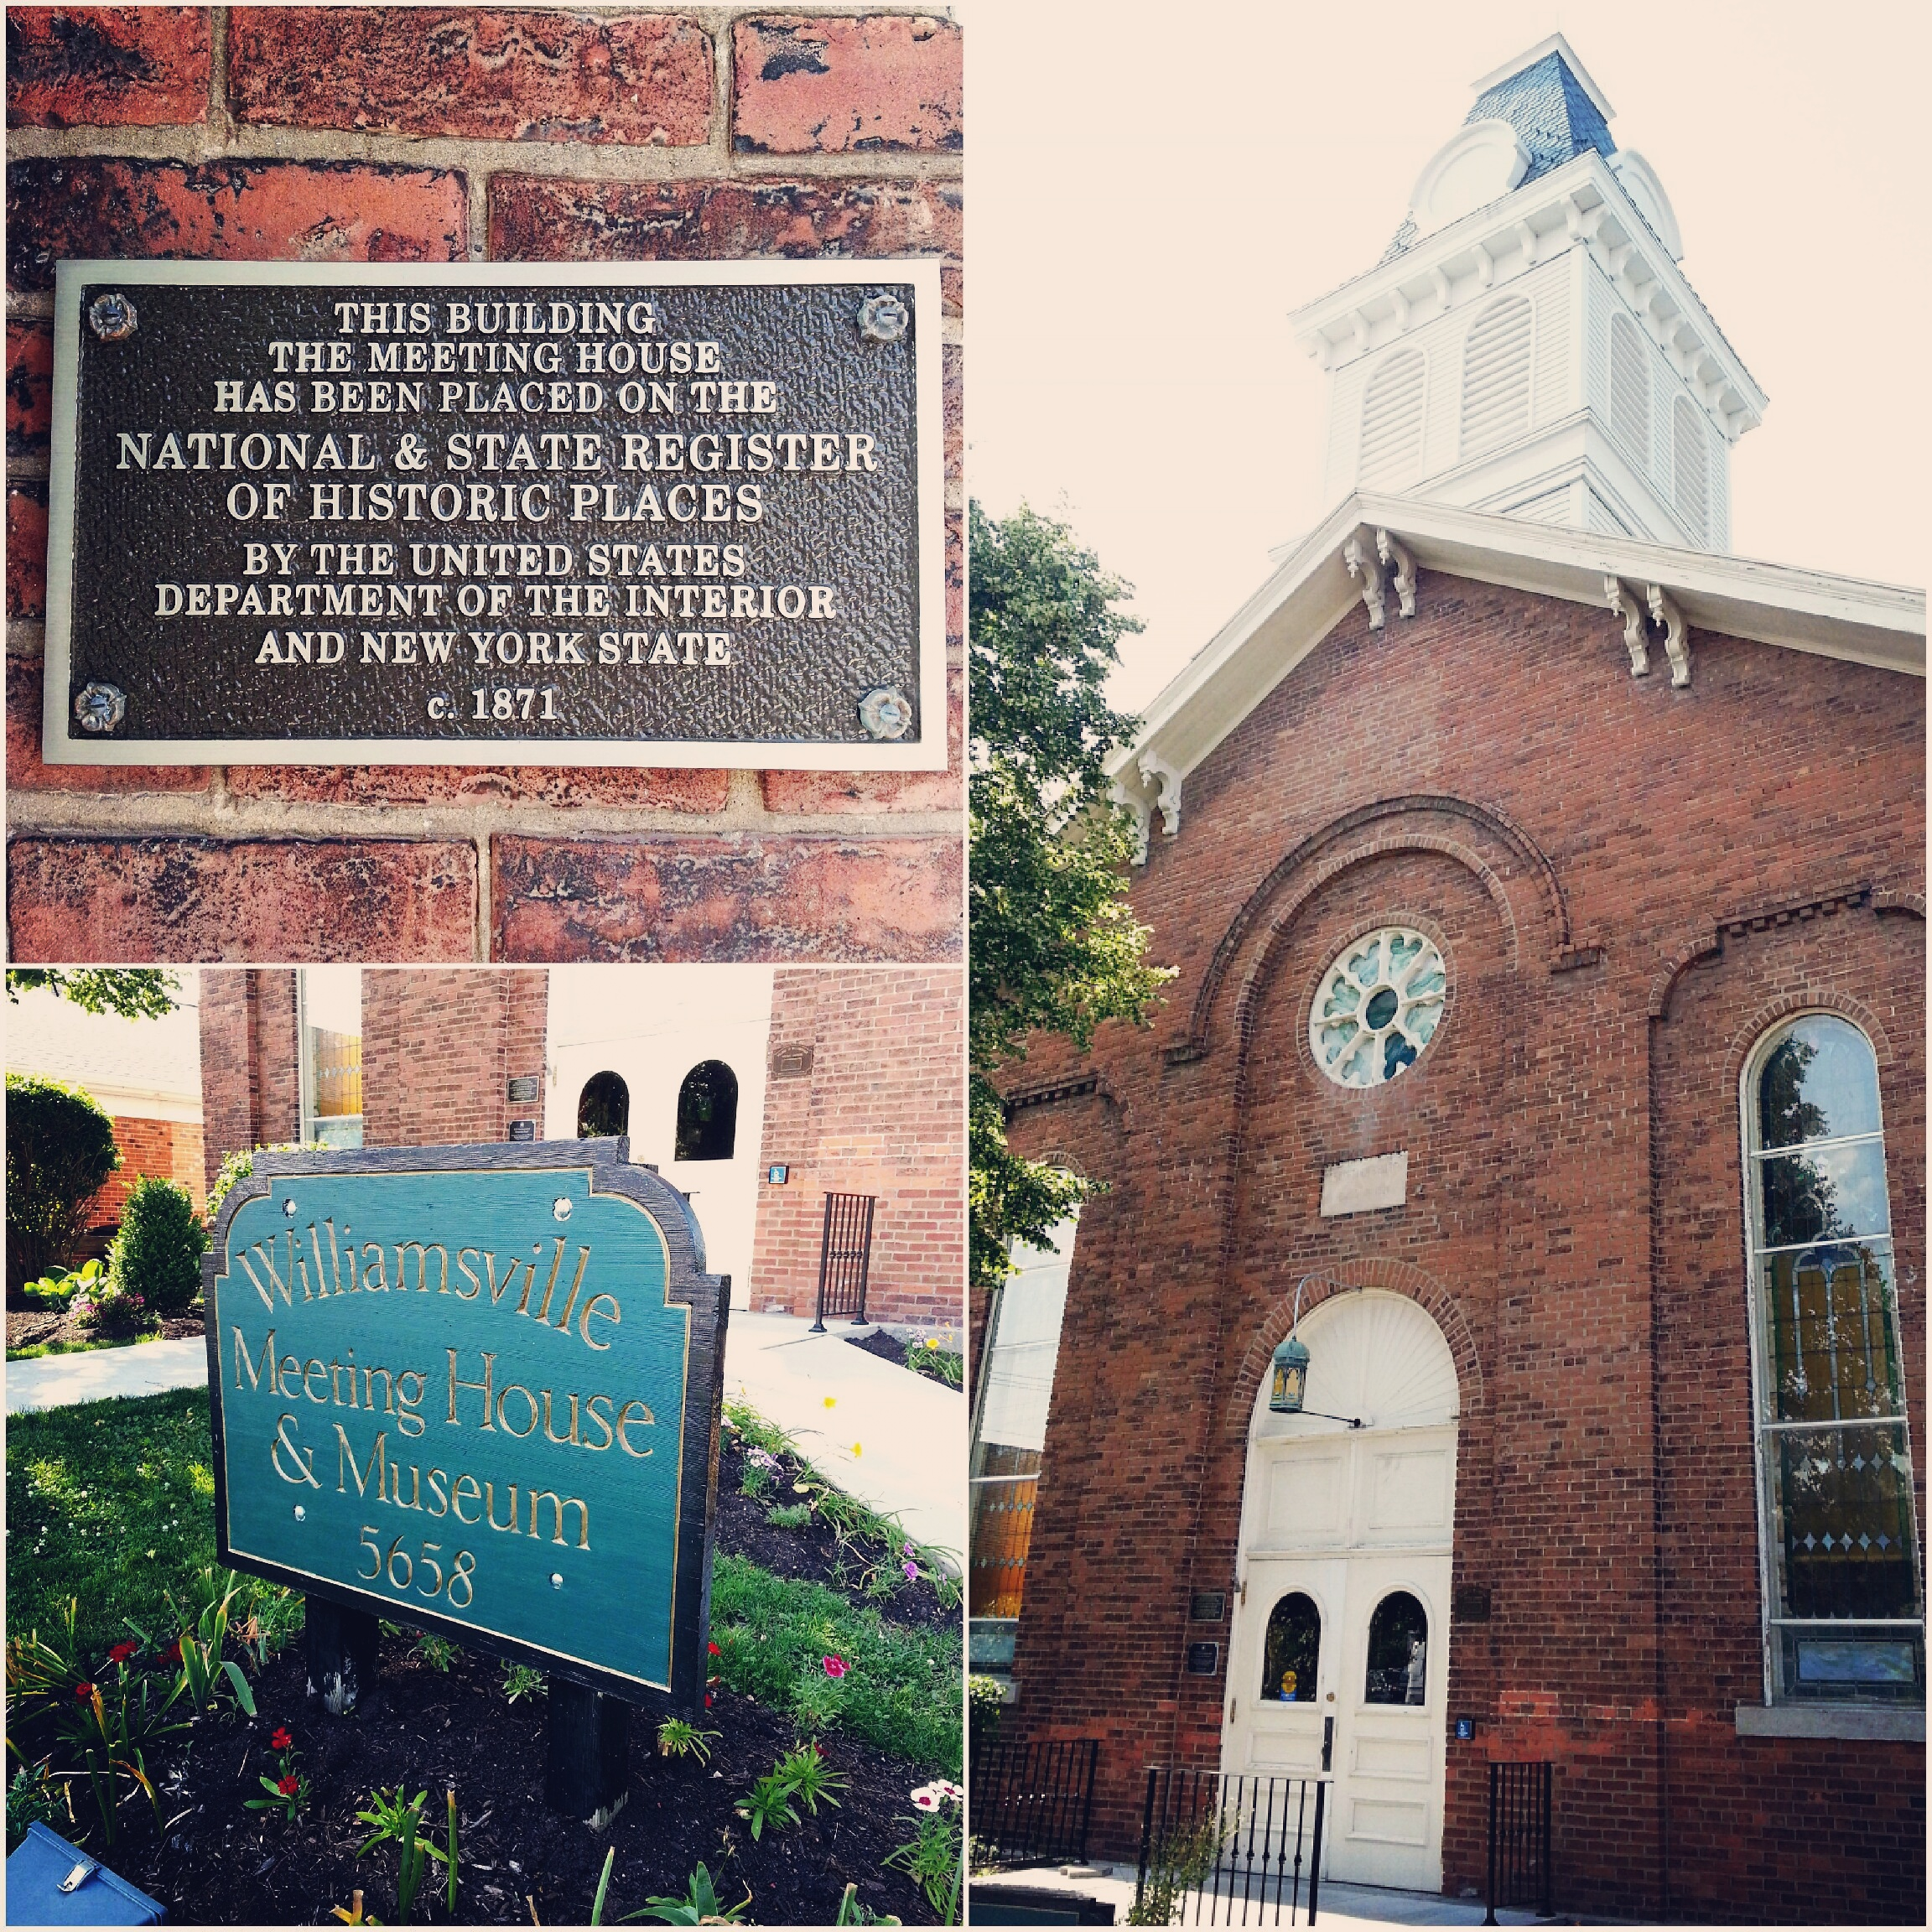 Meeting House Church.  Since 1871.